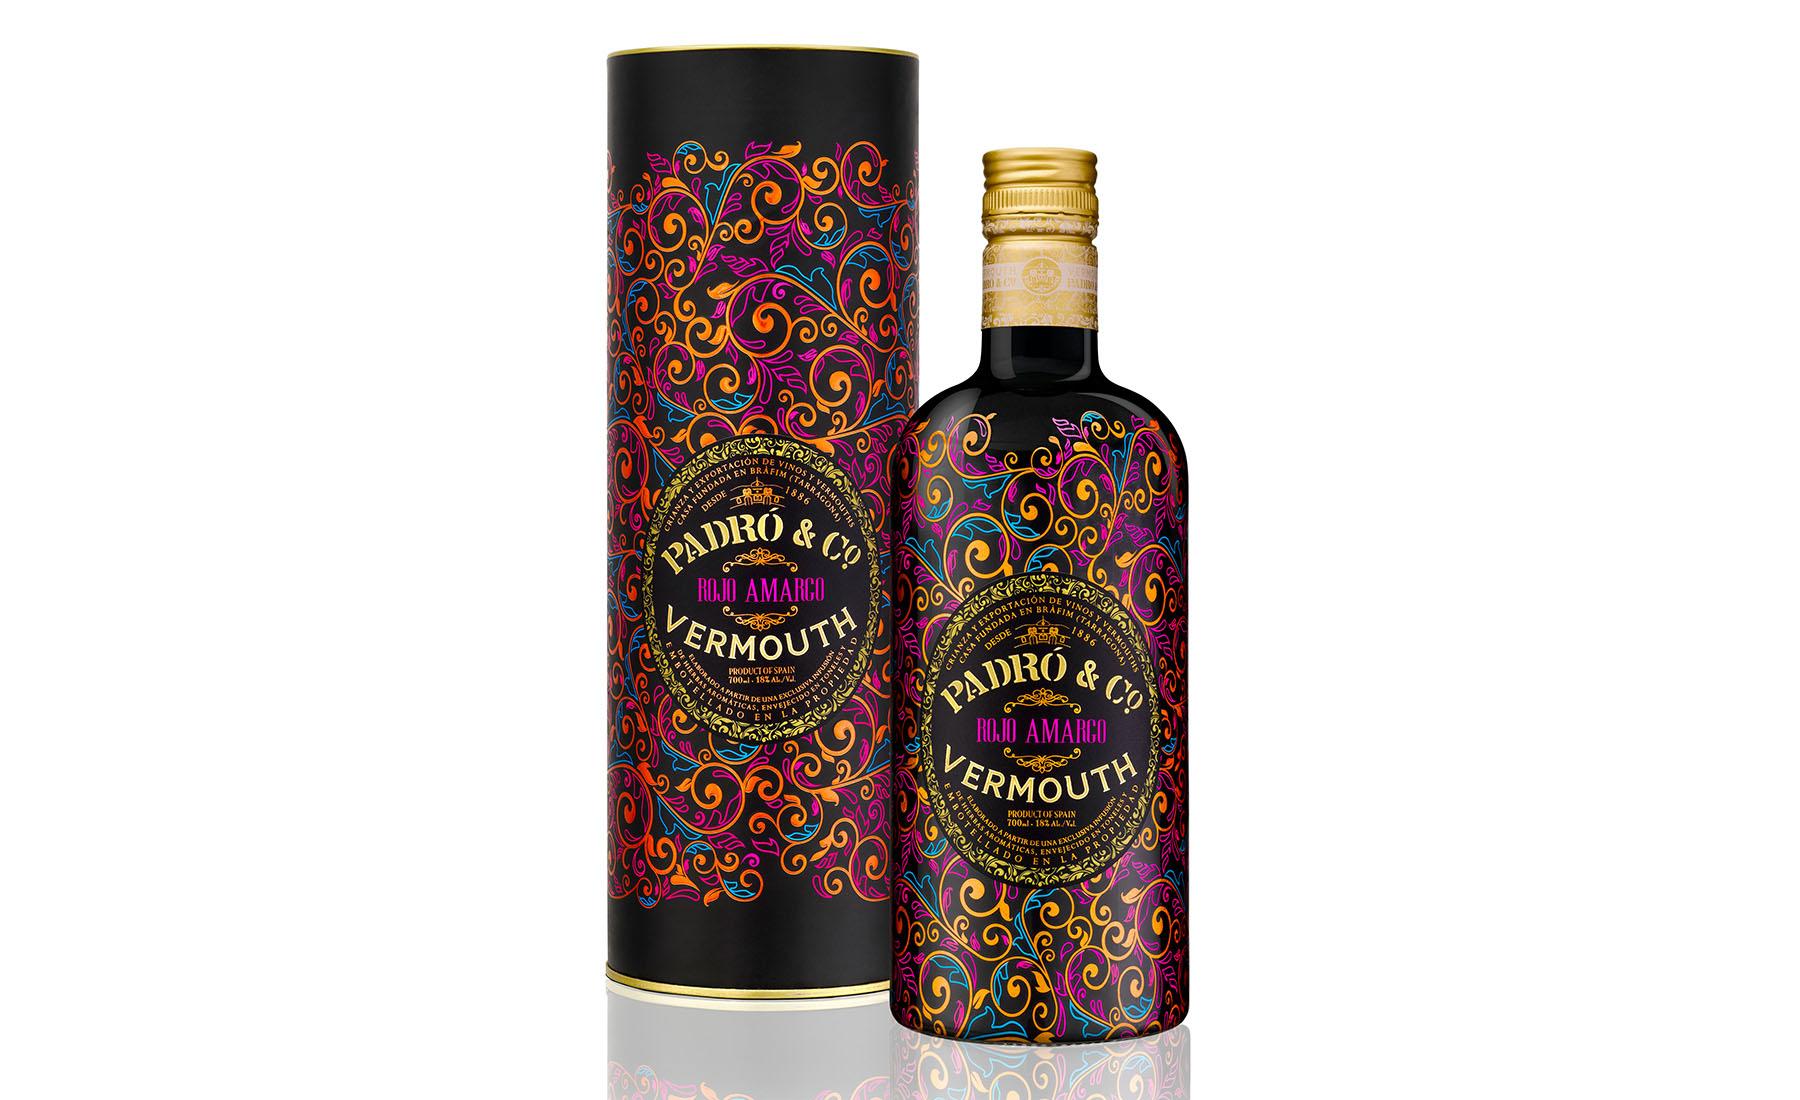 Vermouth Padró & Co. ROJO AMARGO